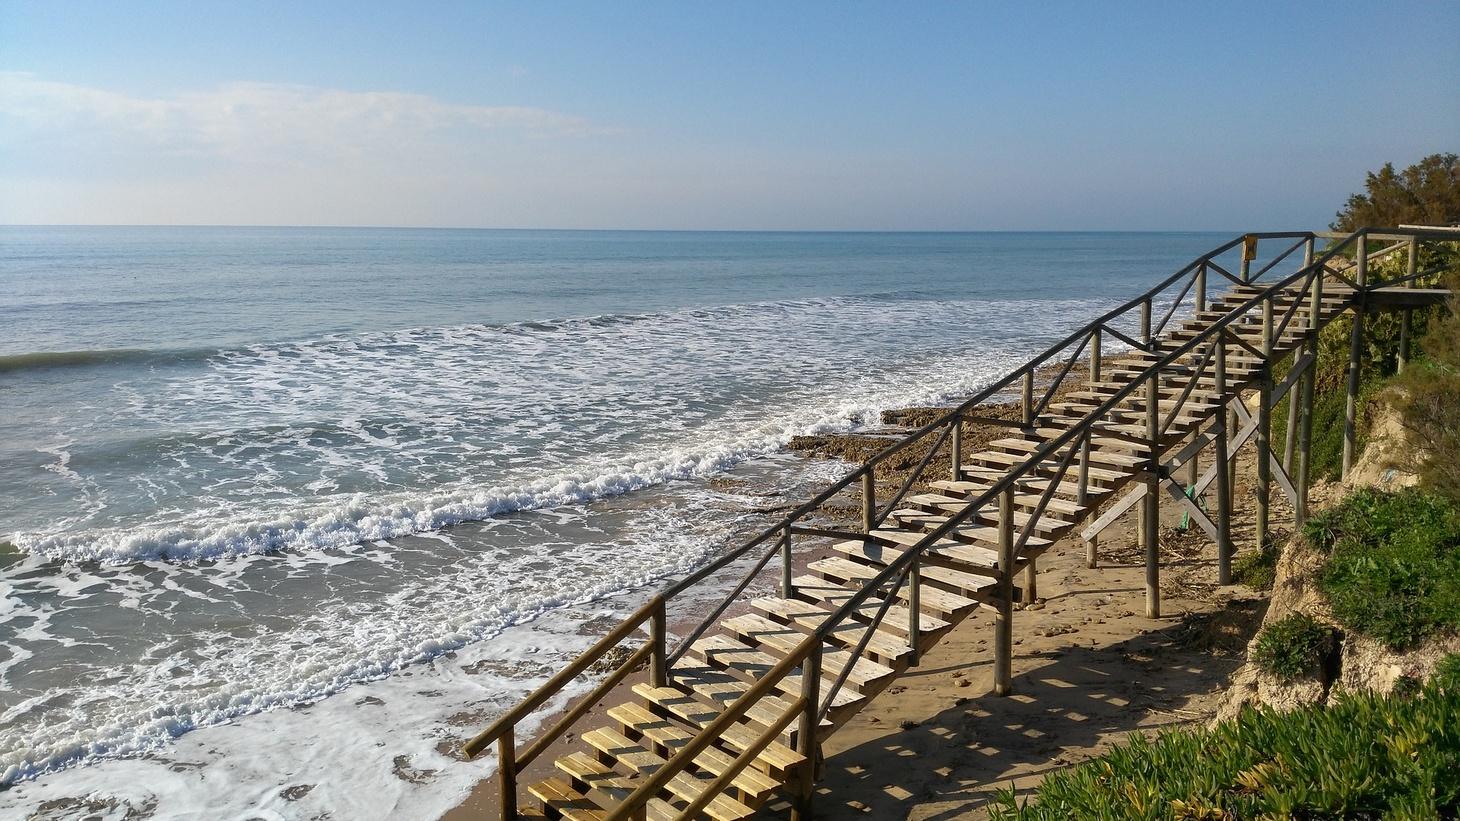 A staircase down to the beach.